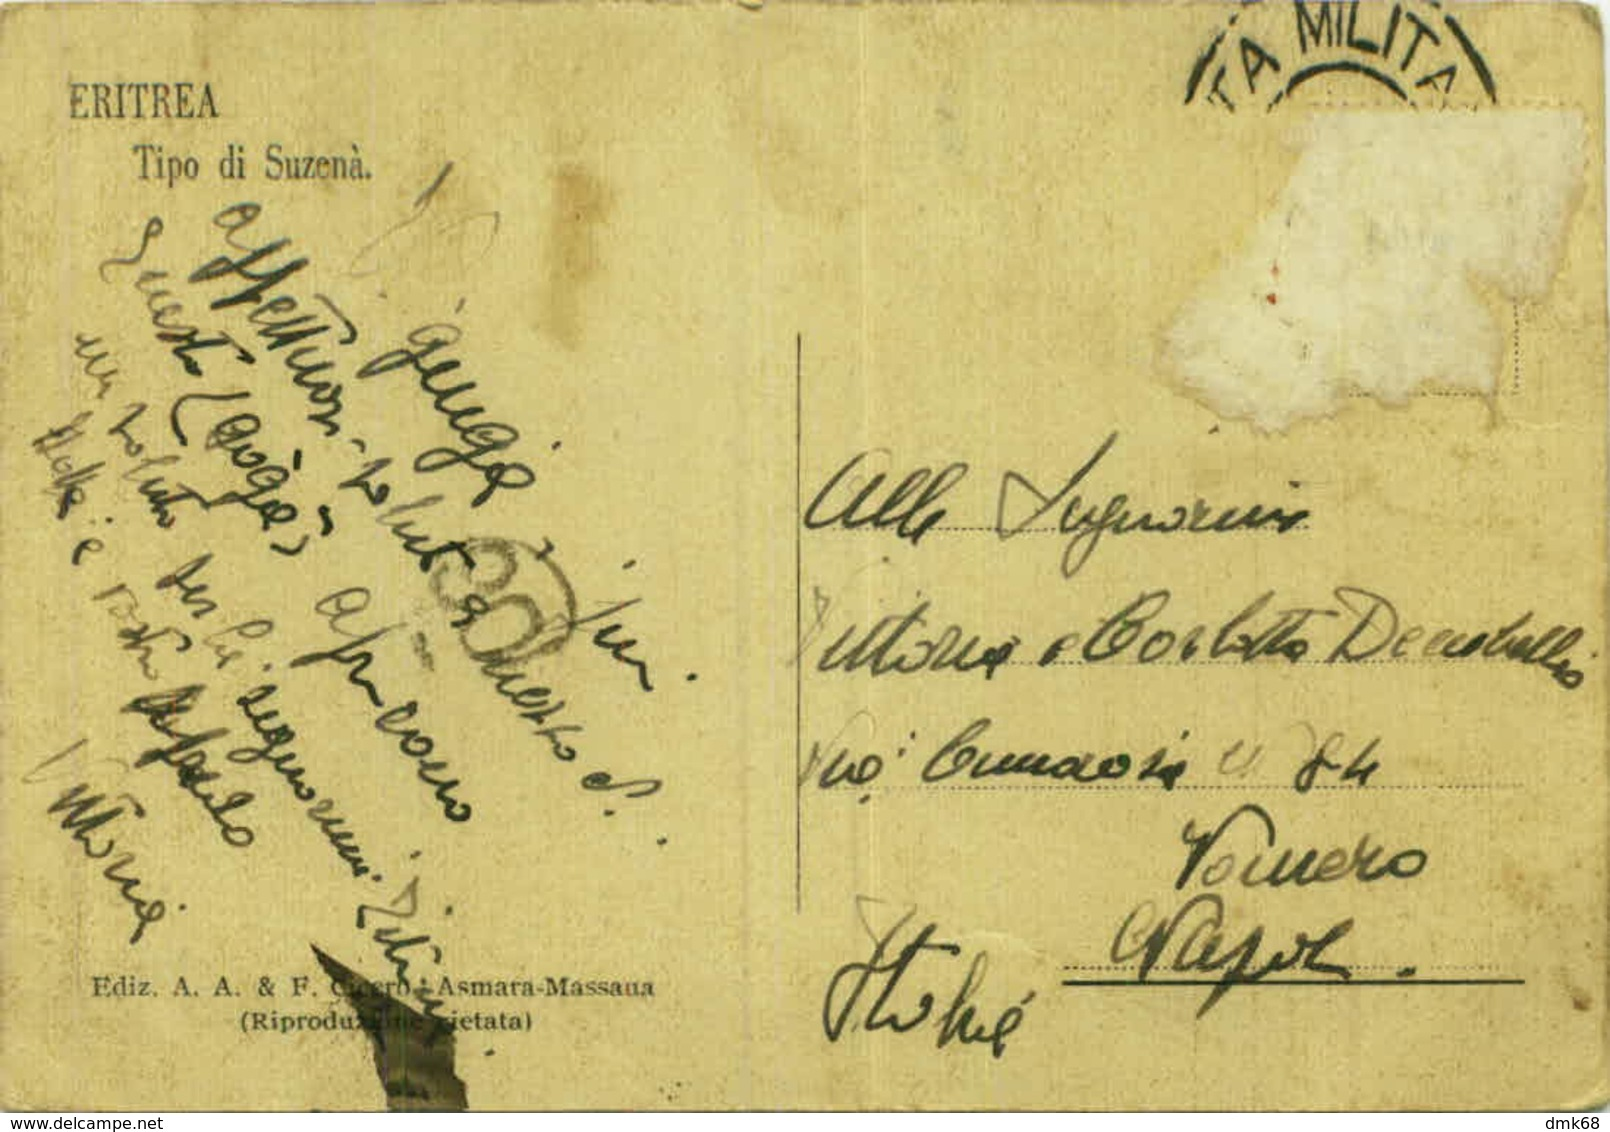 AFRICA - ERITREA - TYPE OF SUZEMA -  BARE-CHESTED MAN - EDIT- A.A. & F. CICERO - 1920s (BG3898) - Eritrea